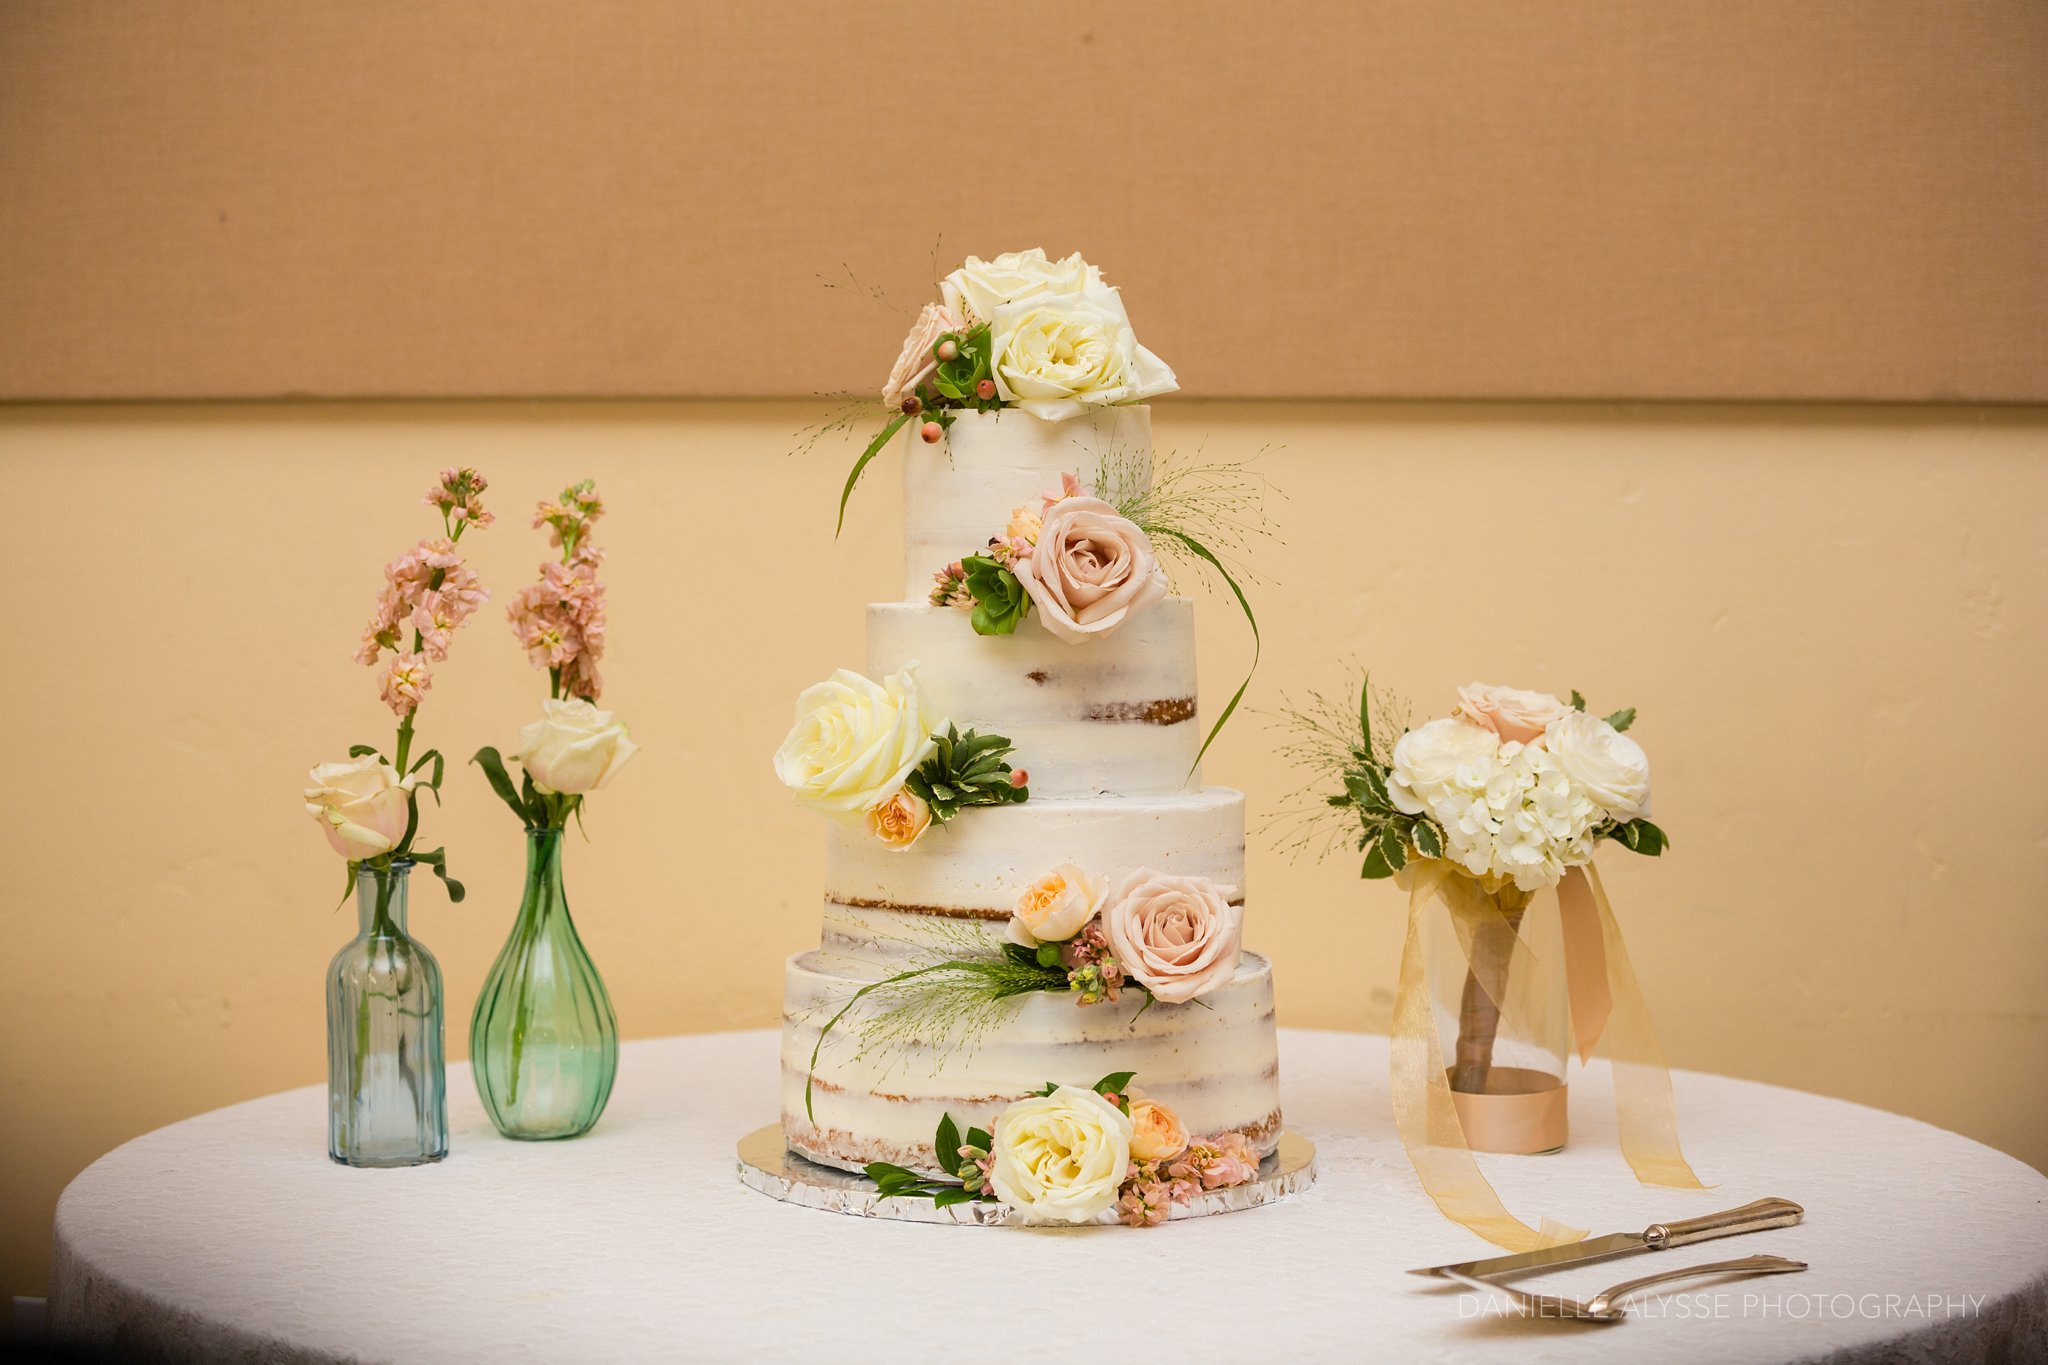 170507_blog_megan_david_wedding_loomis_flower_farm_inn_danielle_alysse_photography_sacramento_photographer0438_WEB.jpg